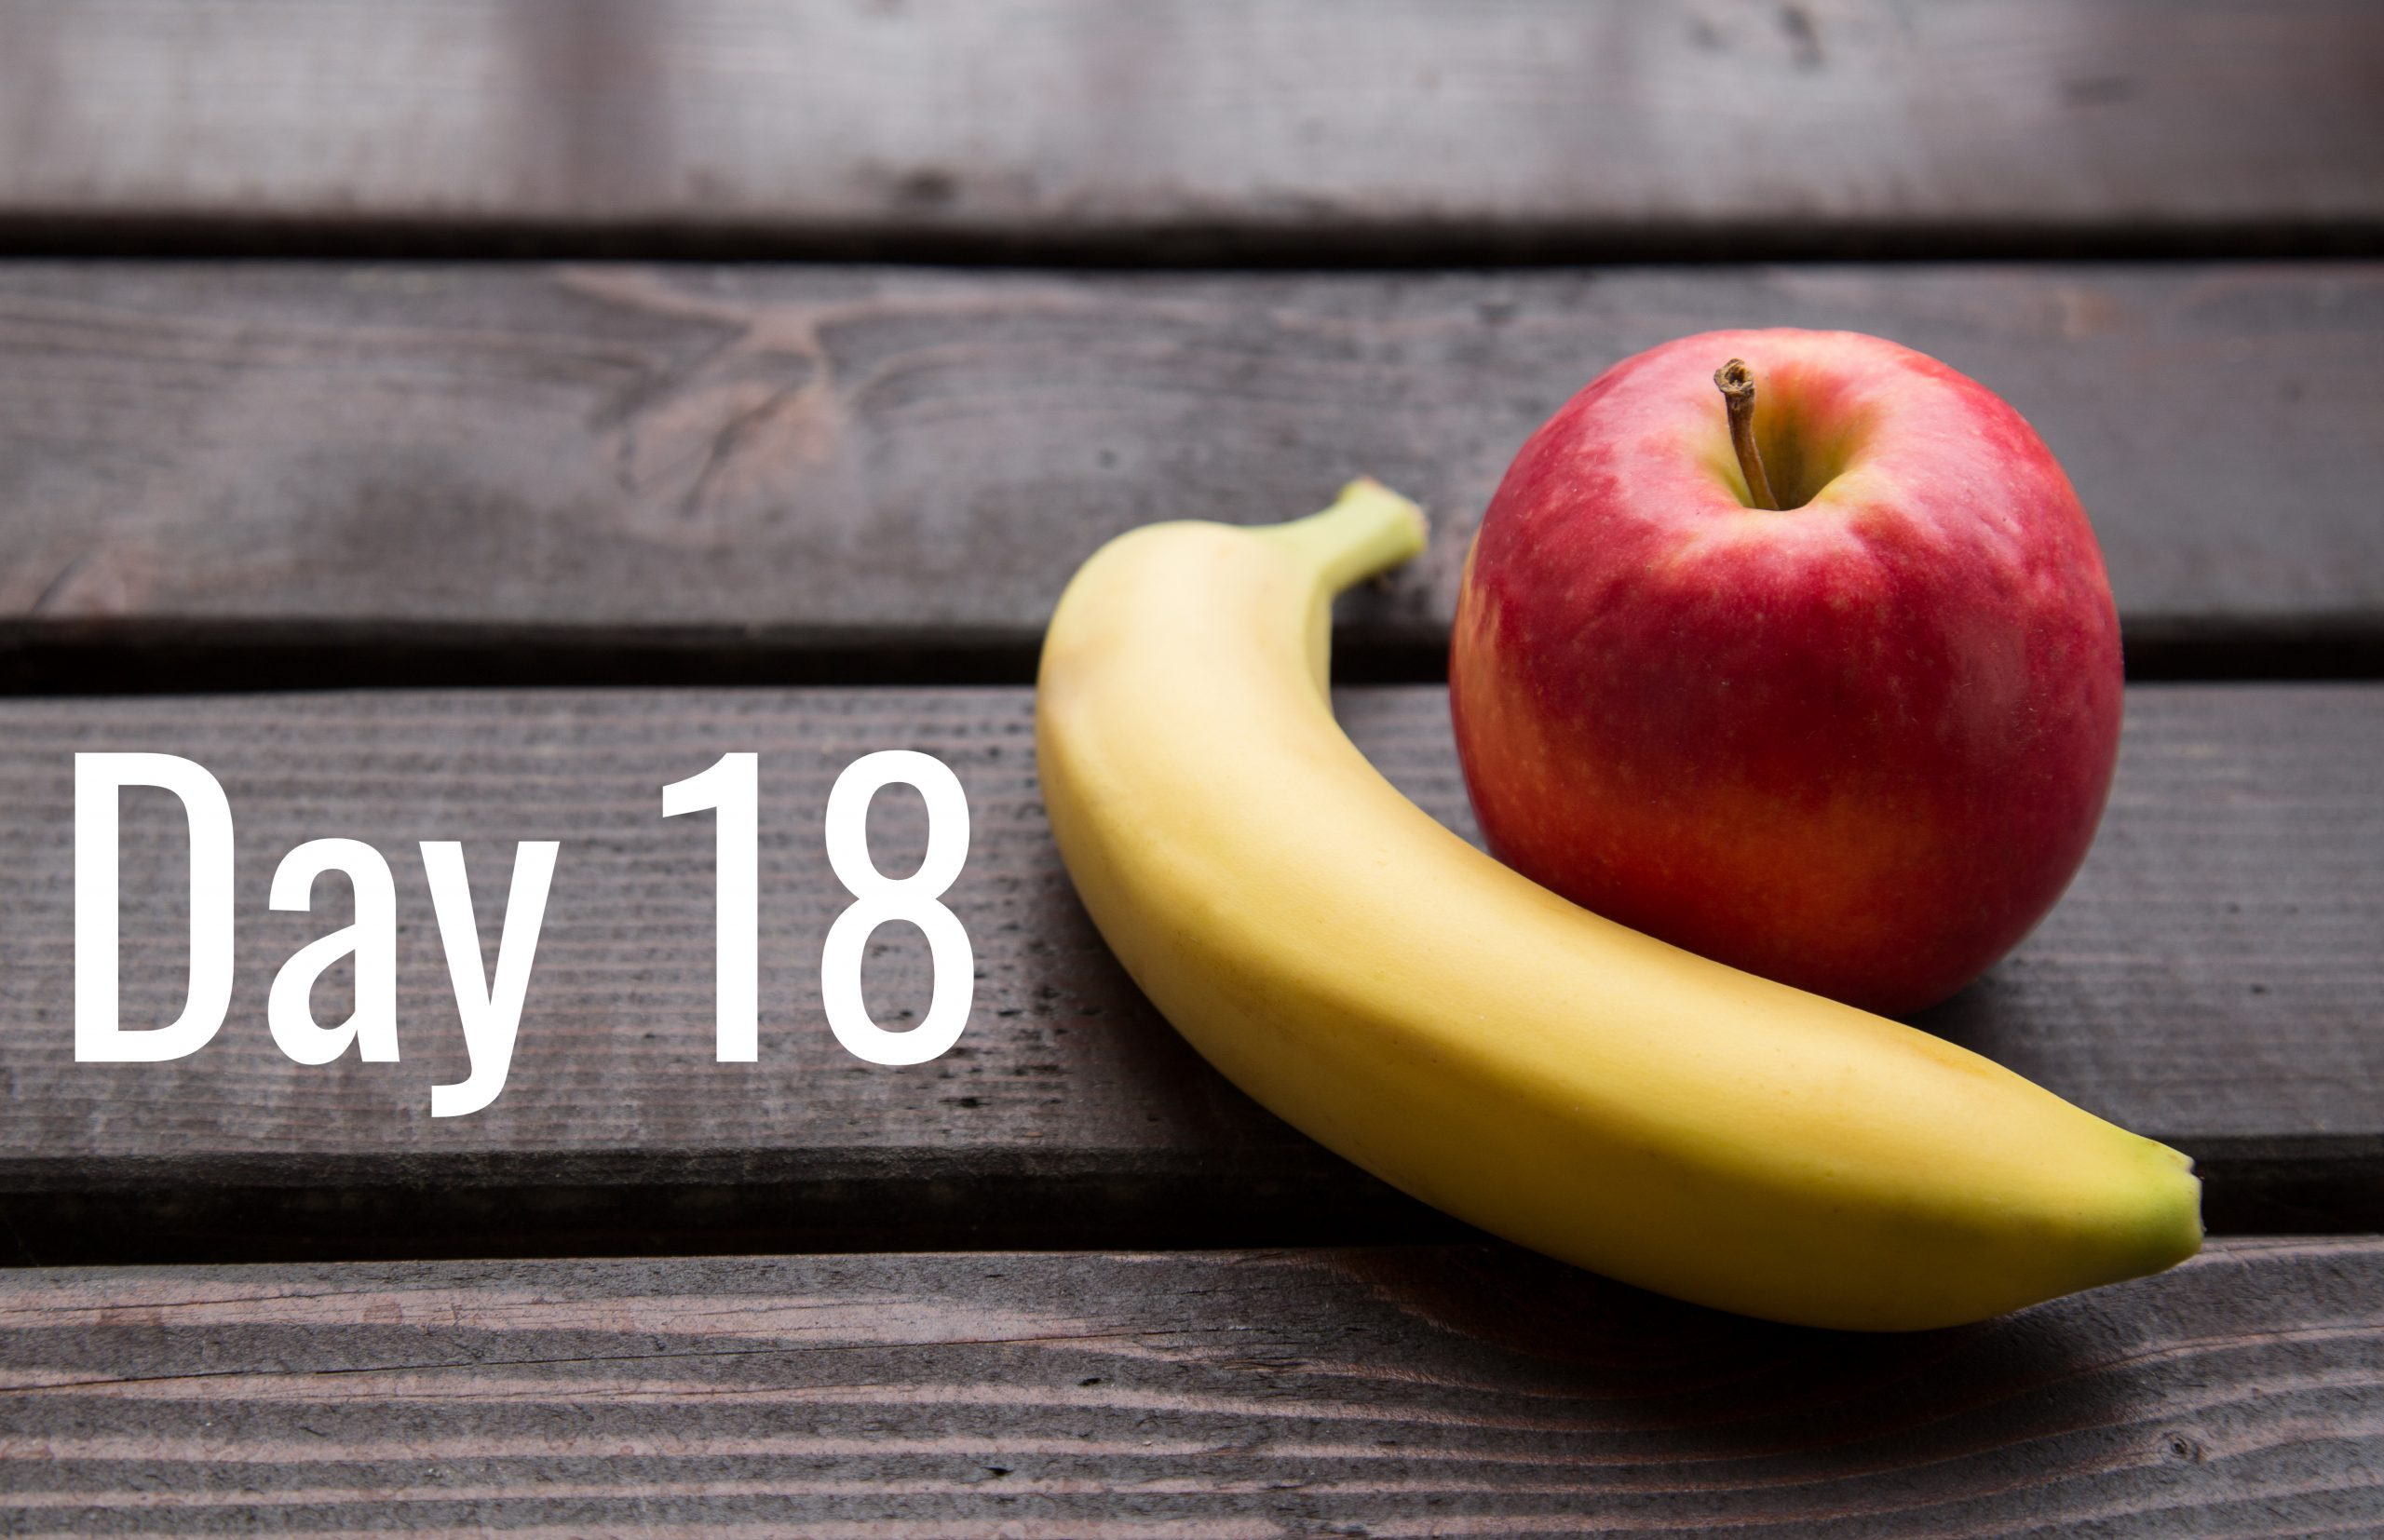 Day 18 – Resisting snack temptation